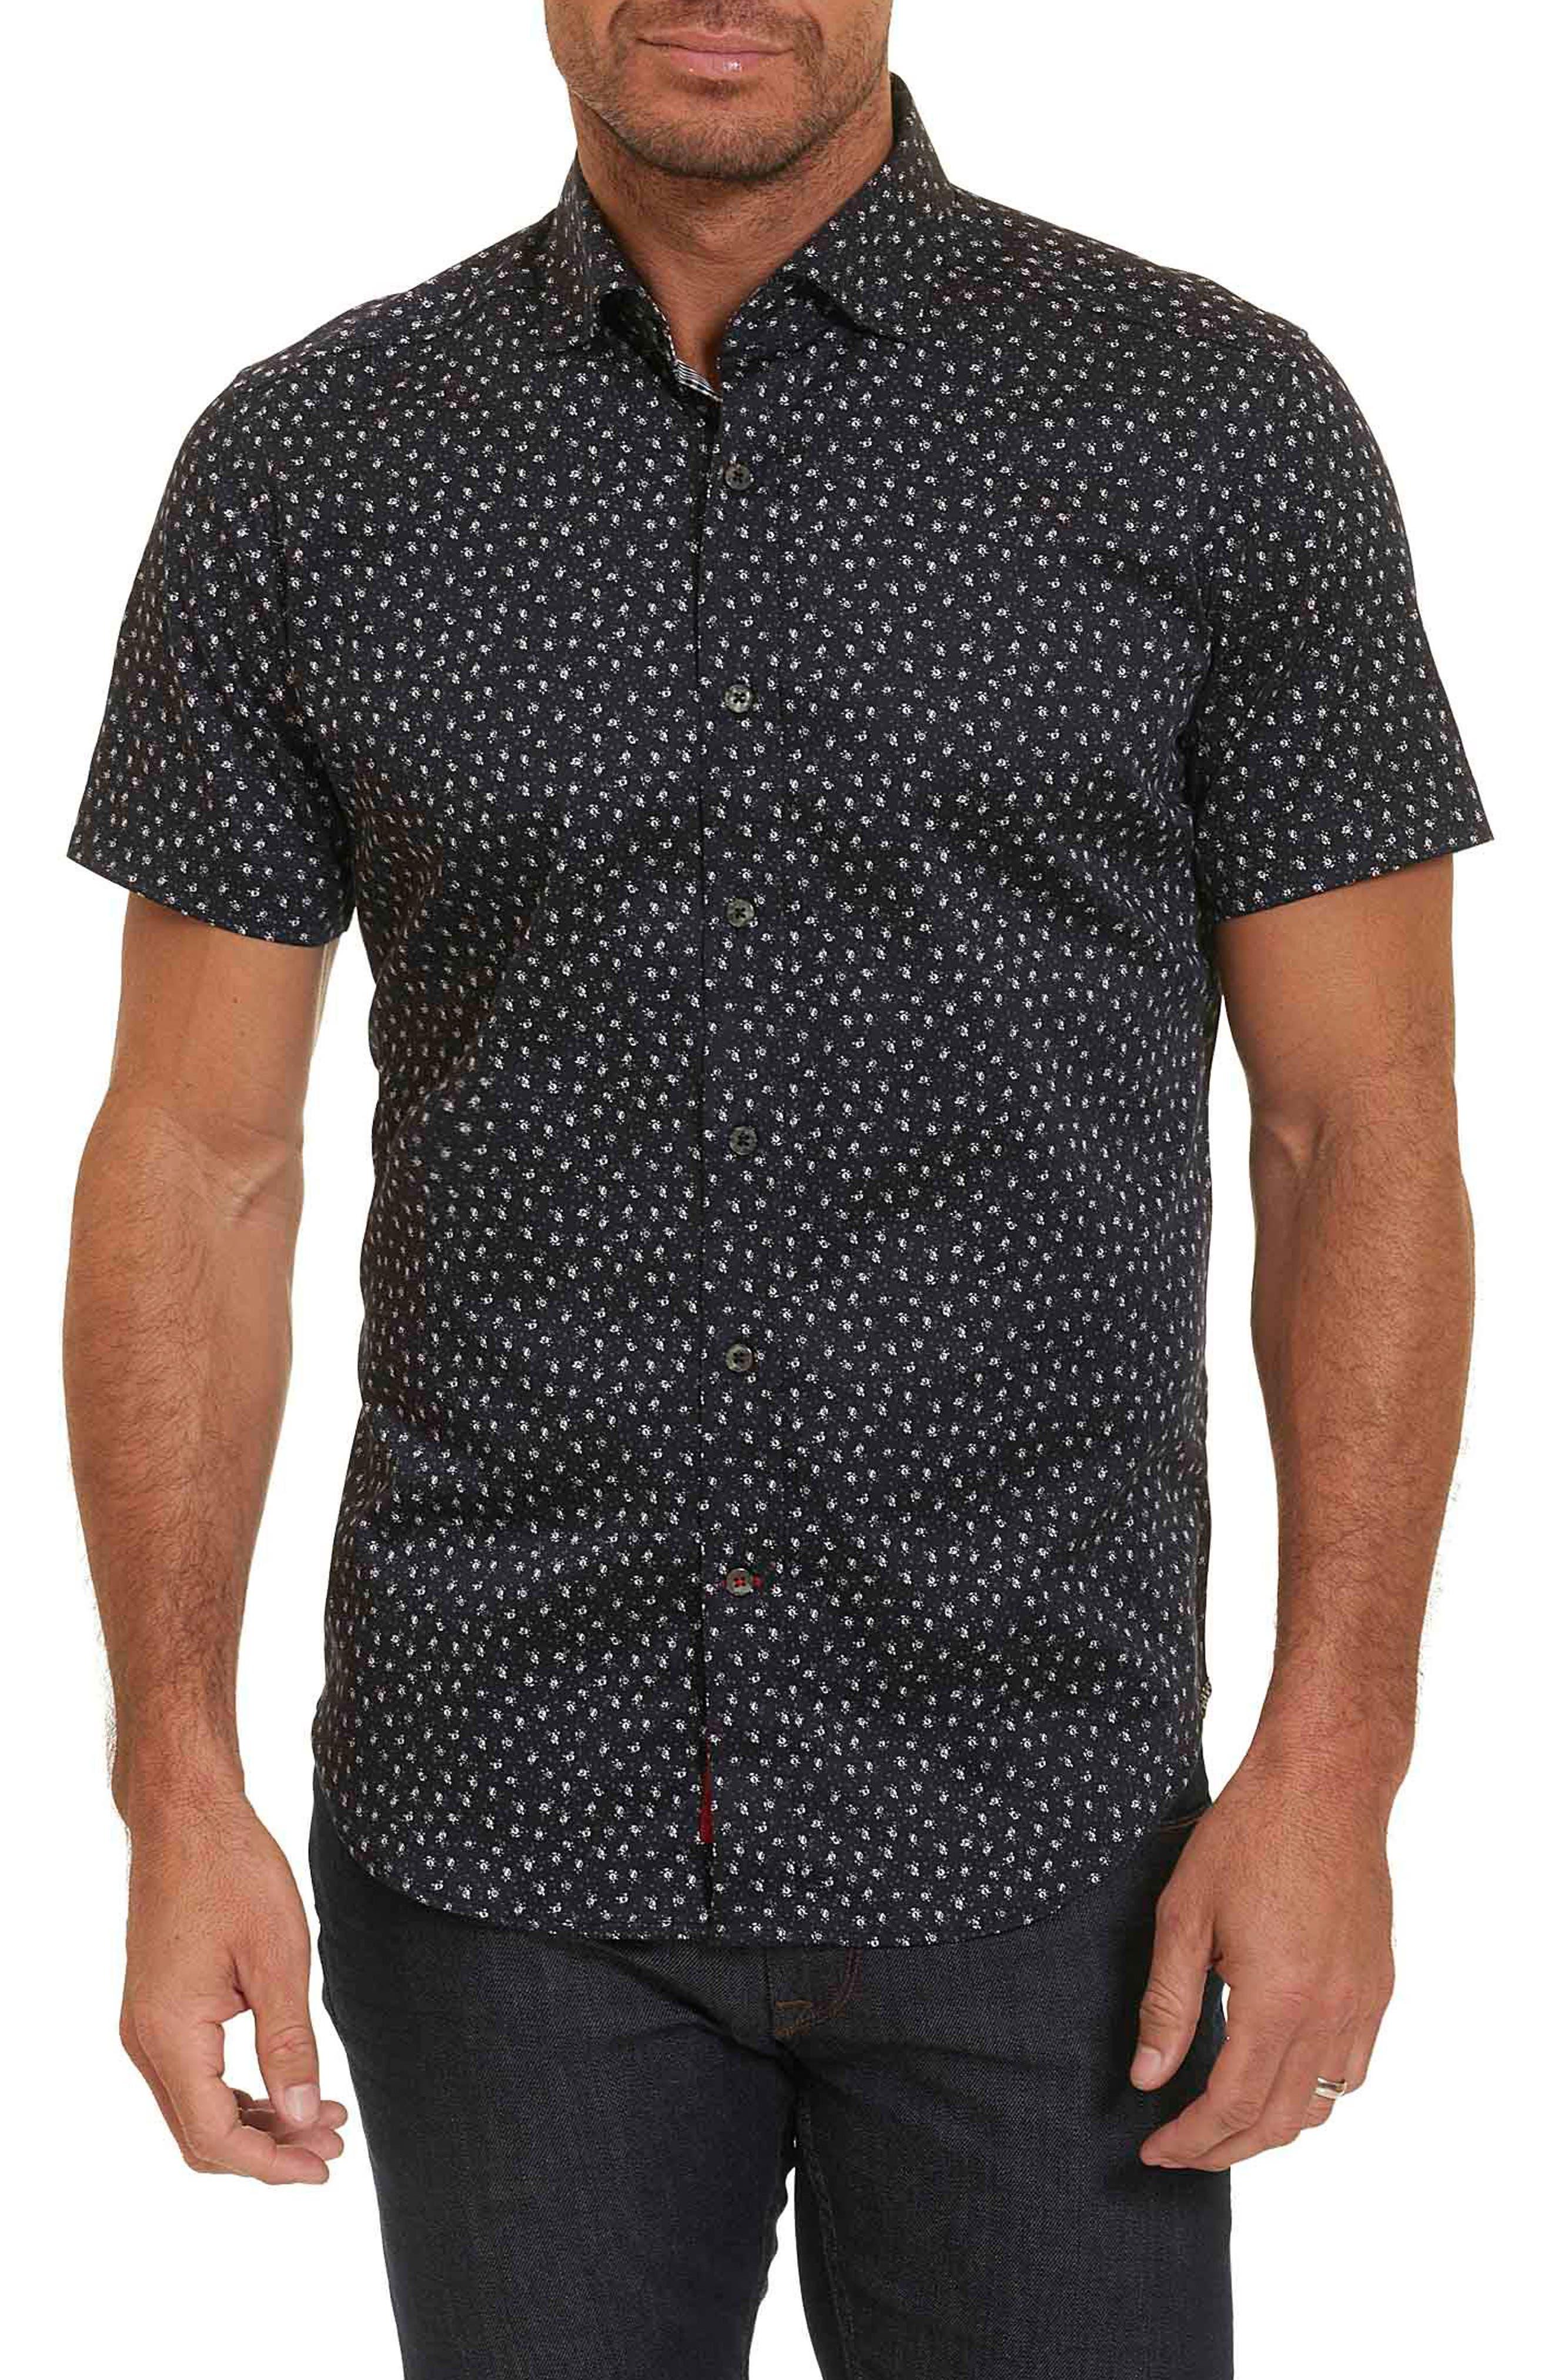 Alternate Image 1 Selected - Robert Graham Miki Tailored Fit Print Short Sleeve Sport Shirt